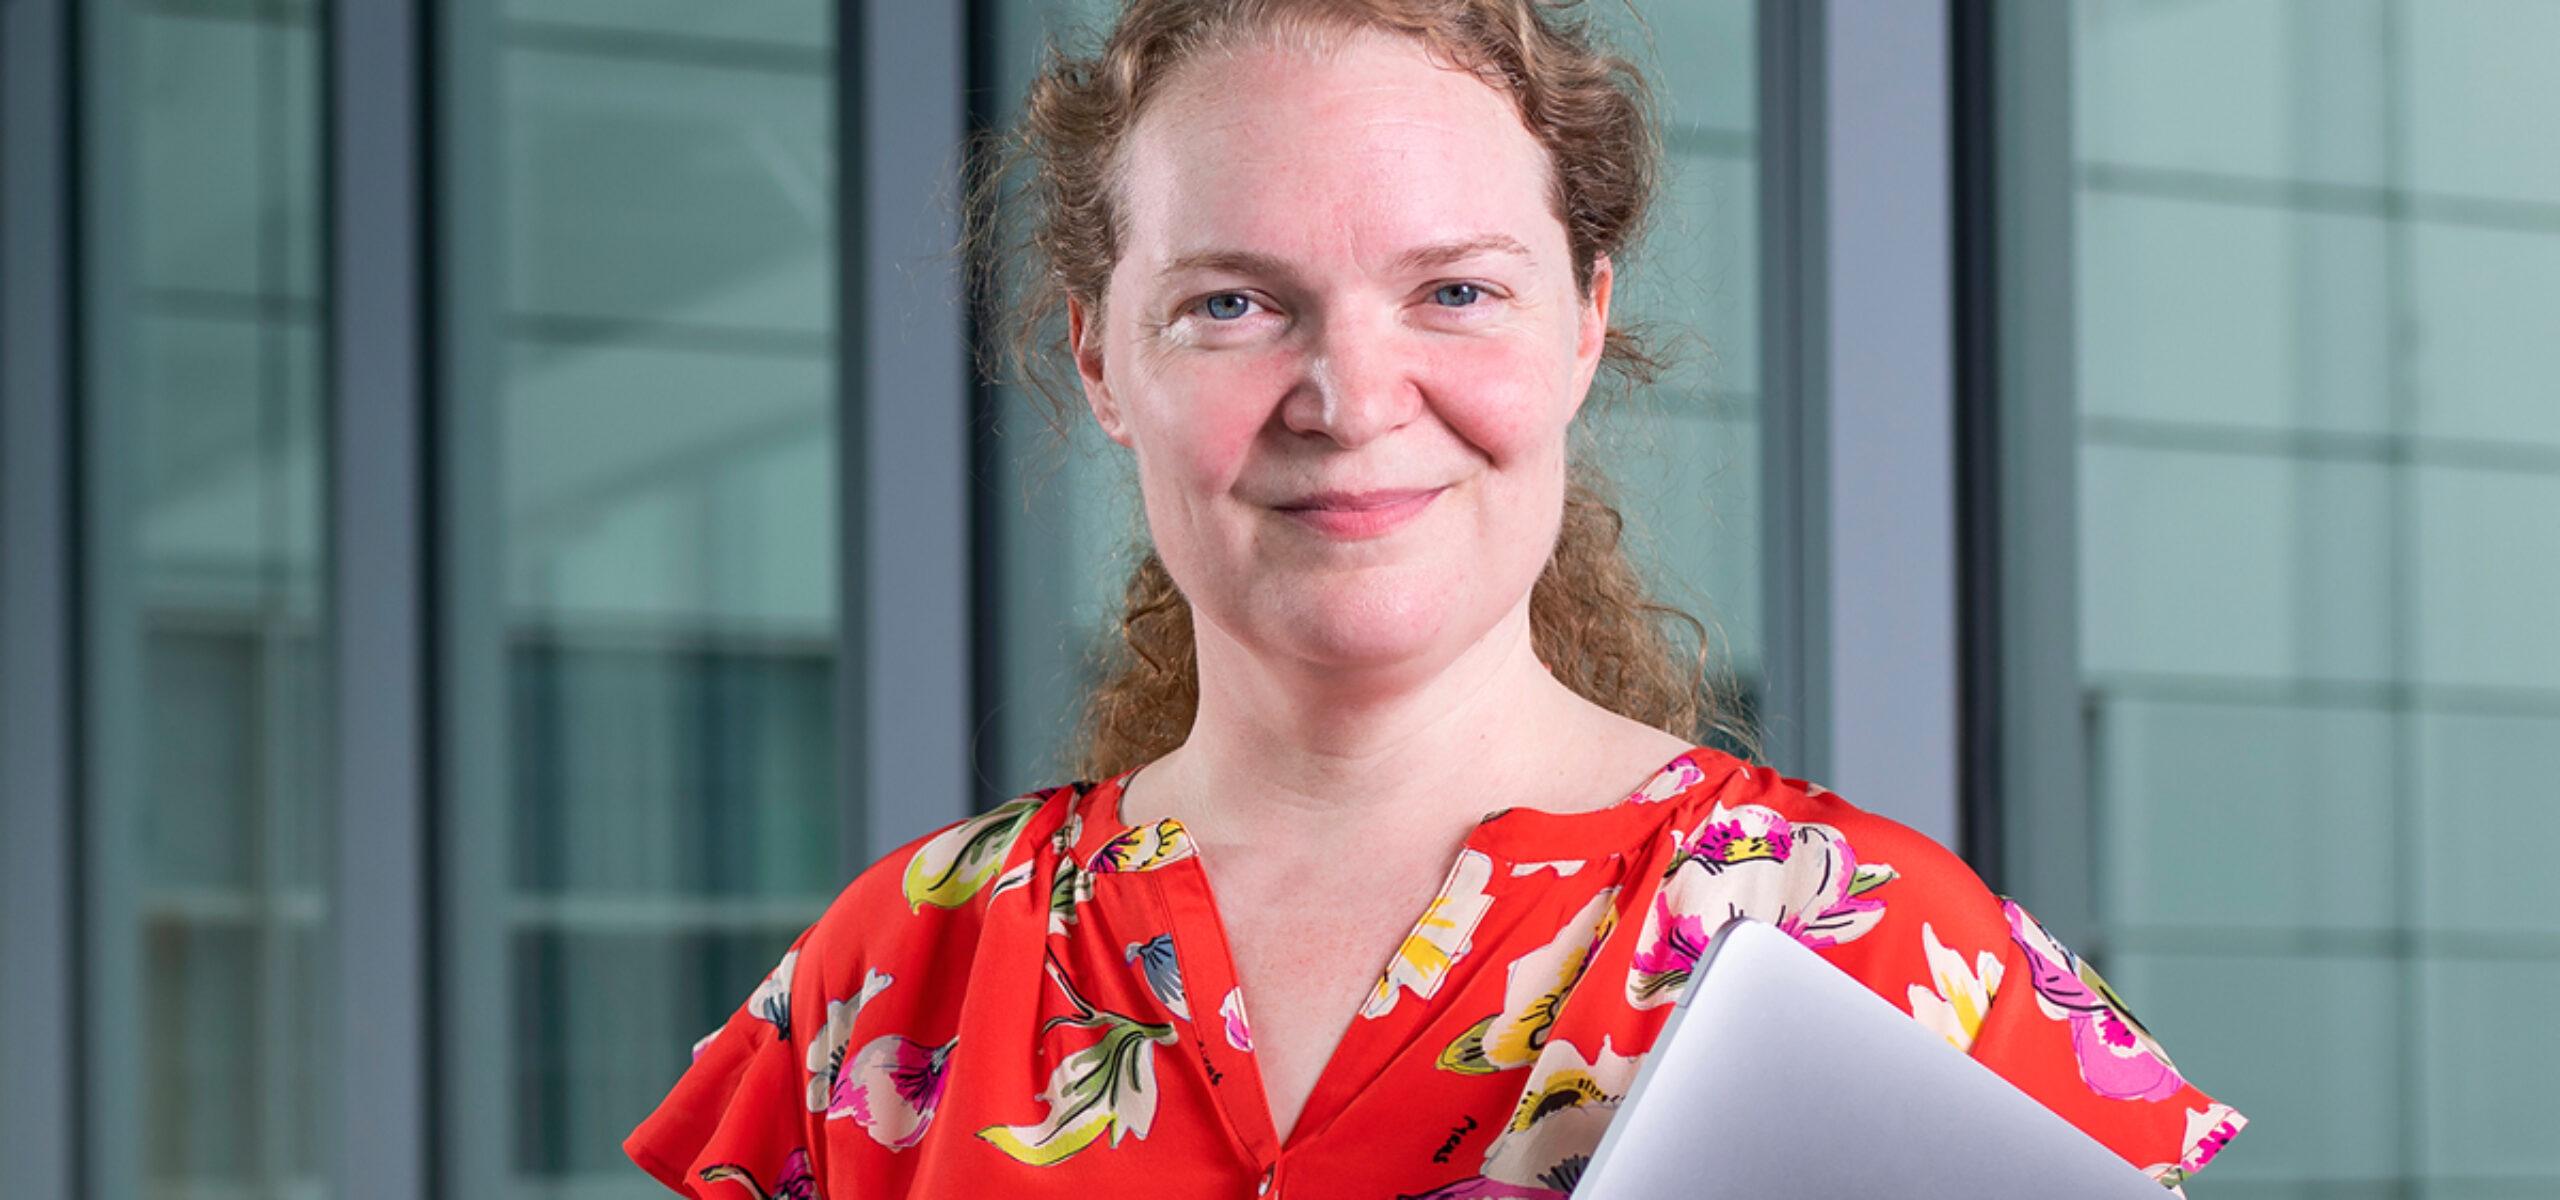 Professor Emma Crosbie headshot